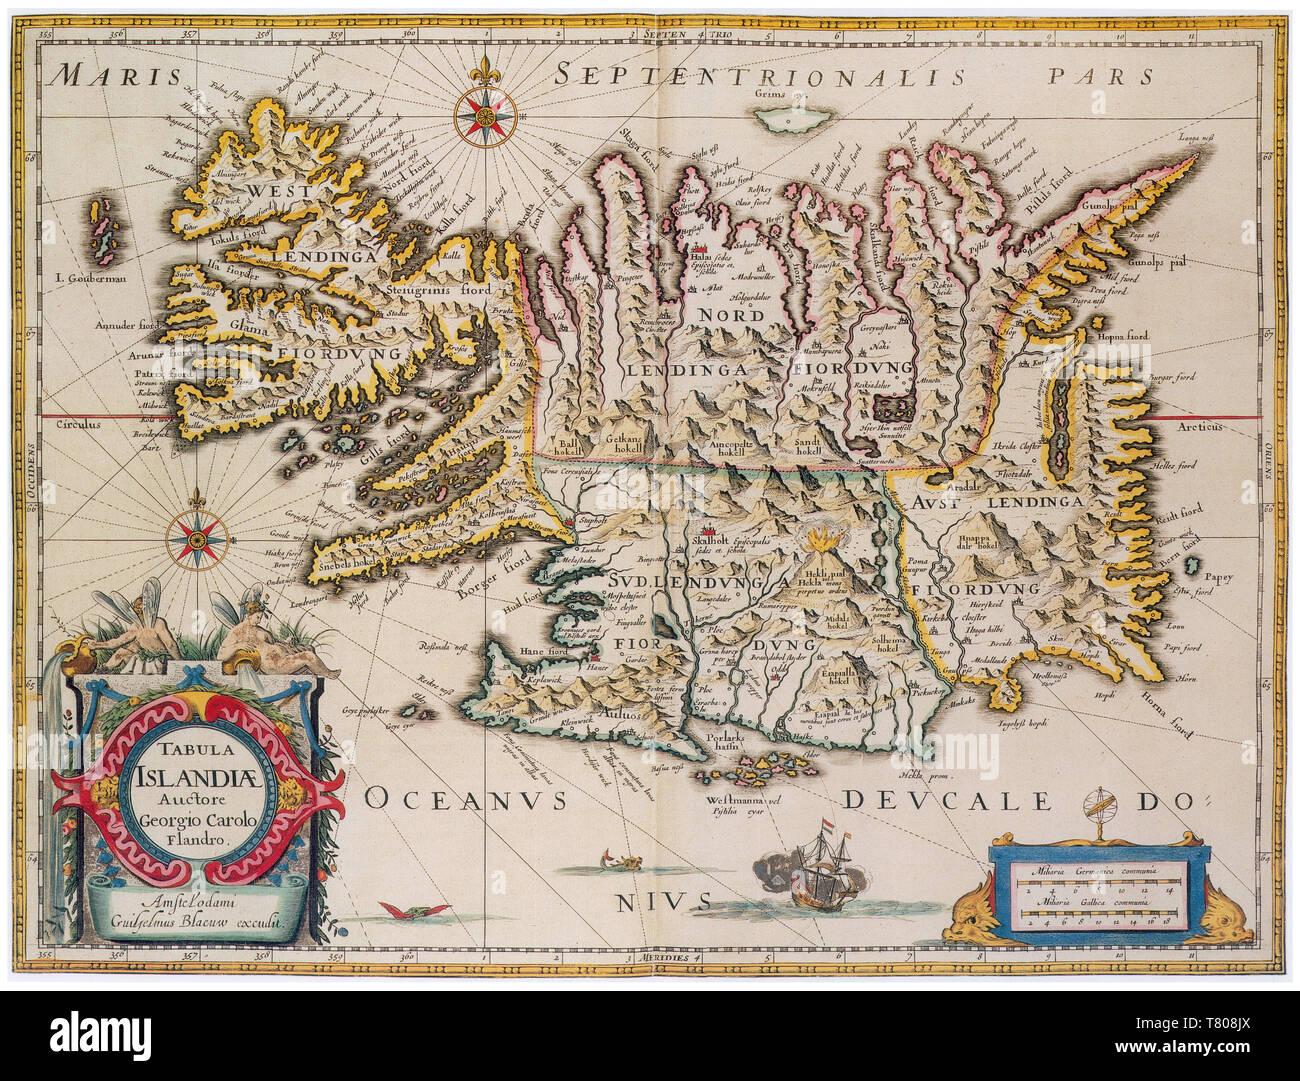 Joan Blaeu, Iceland Map, 17th Century - Stock Image